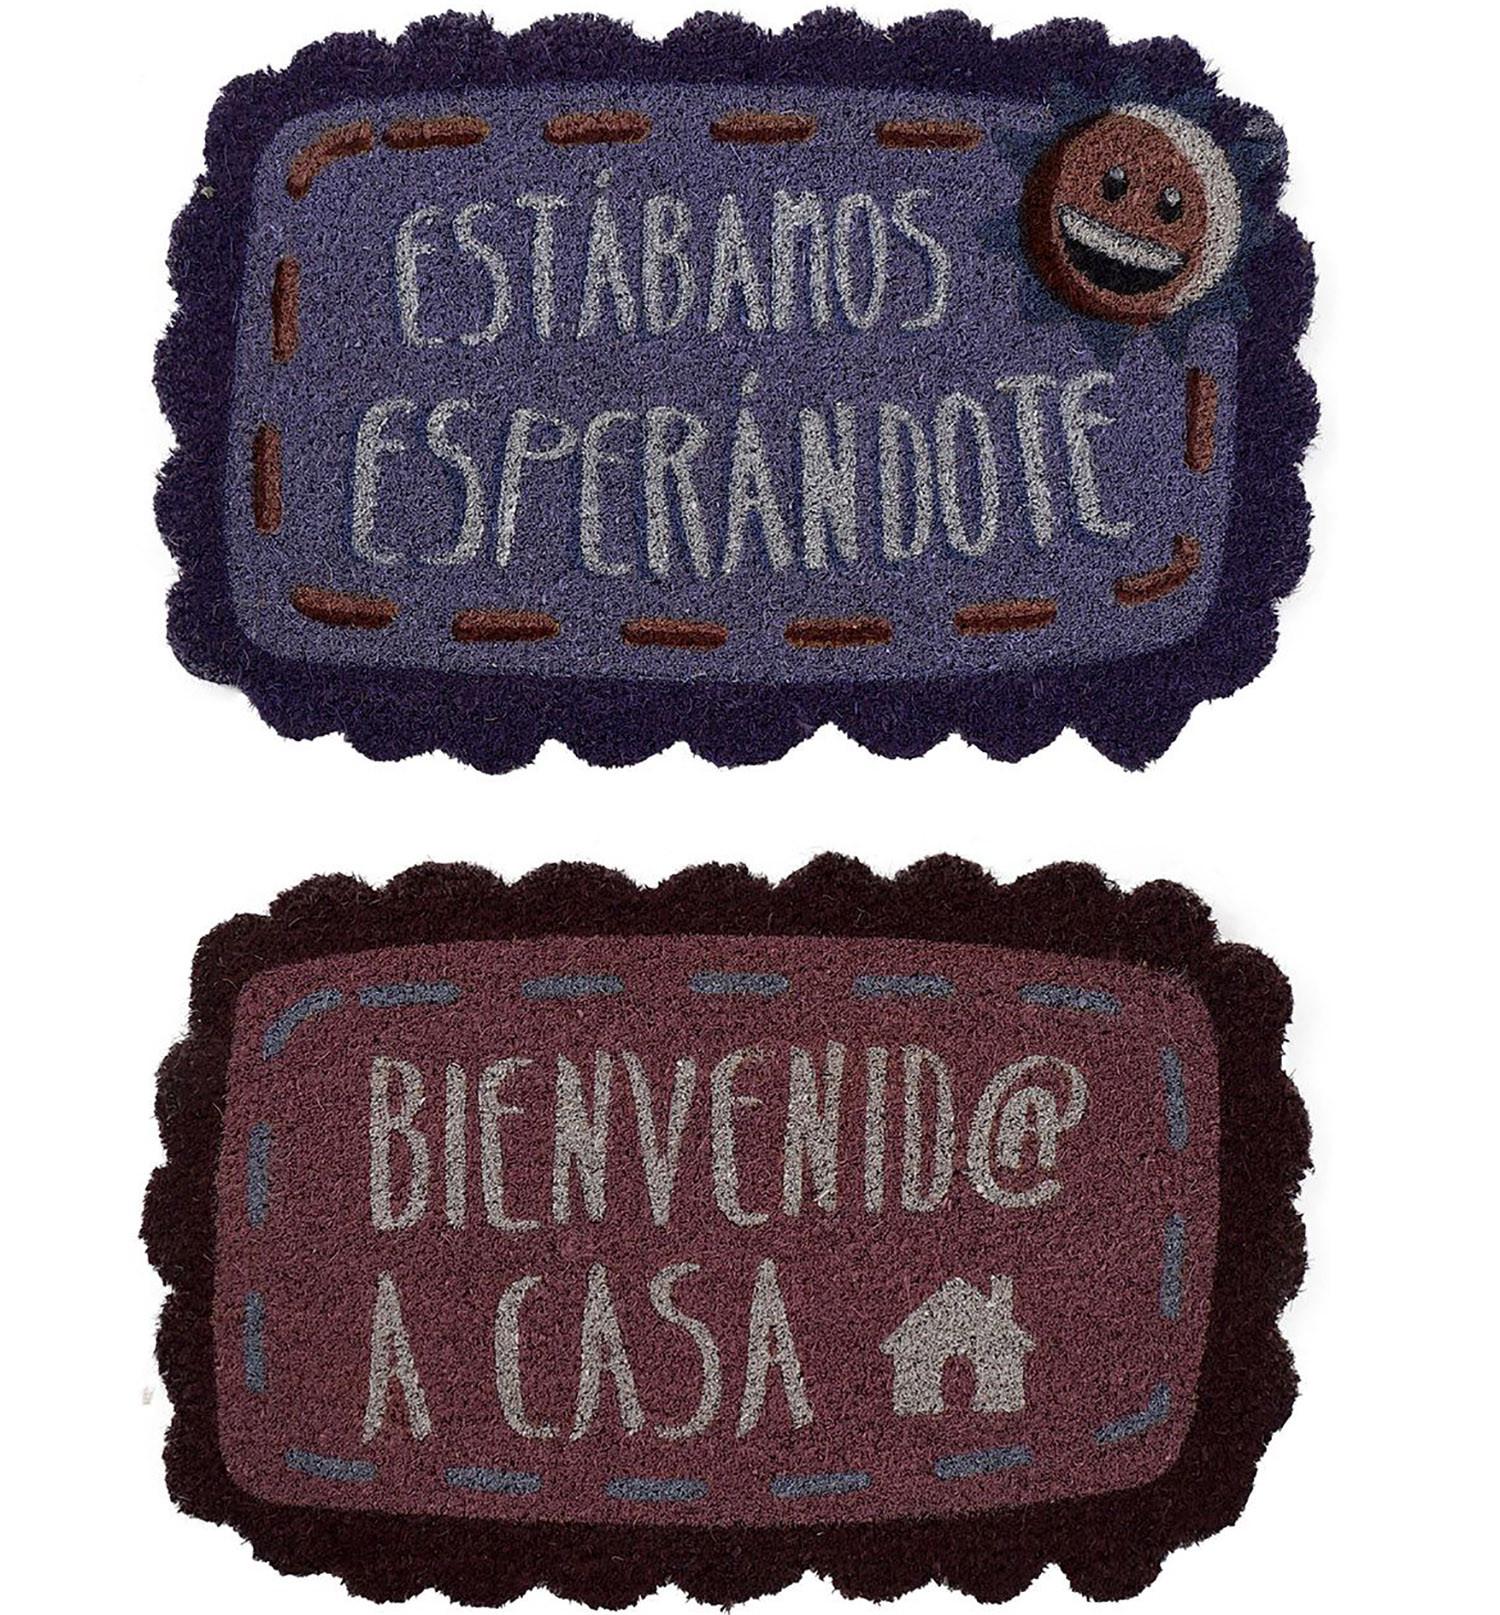 FELPUDO FIBRA COCO NATURAL 60X33X3 CM